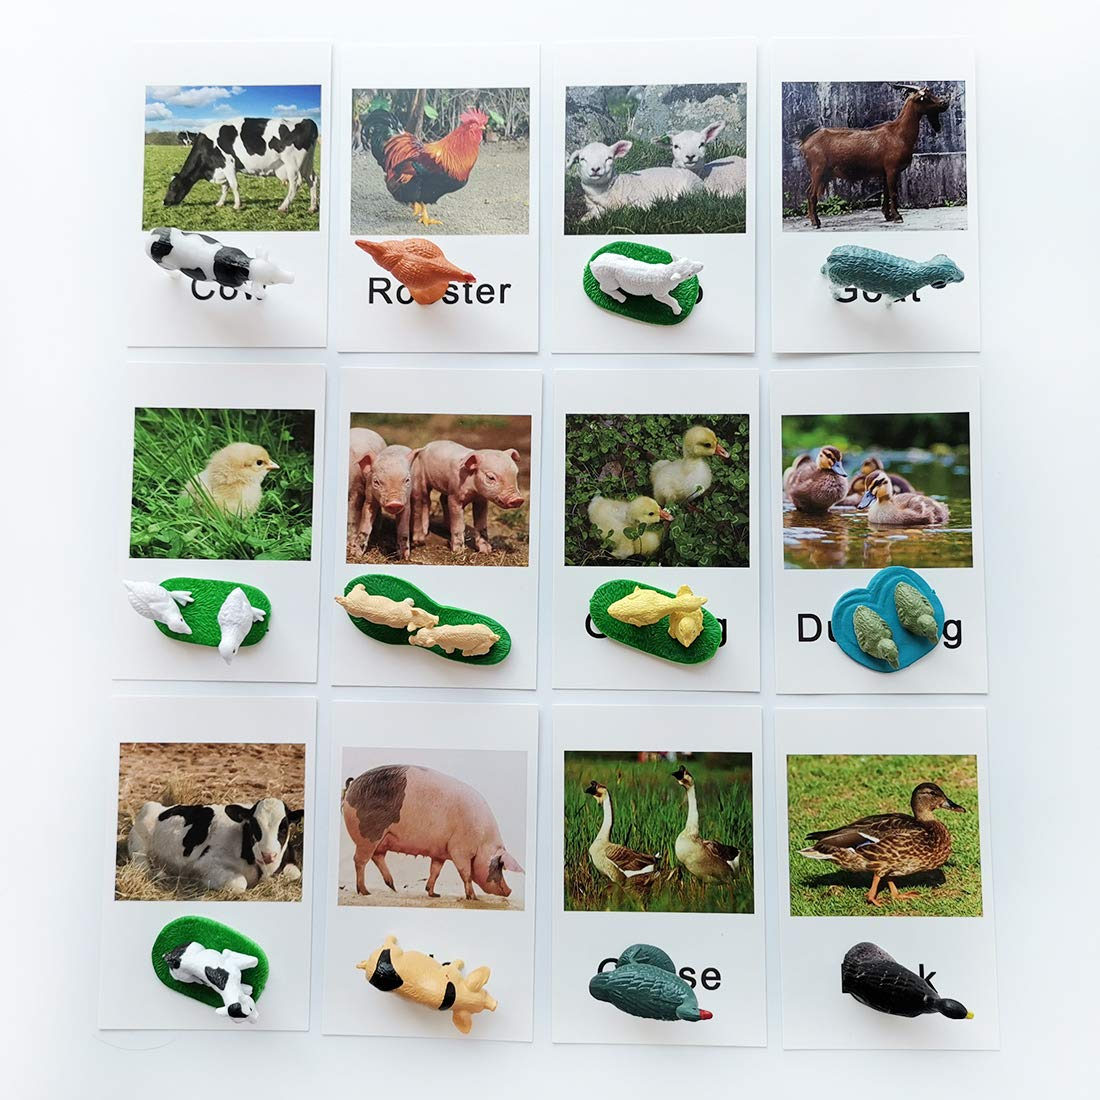 Montessori Animal Match - Miniature Farm Animal Toy Figurines with Matching Cards Montessori Language Materials Preschool Learning Toy NEWT033